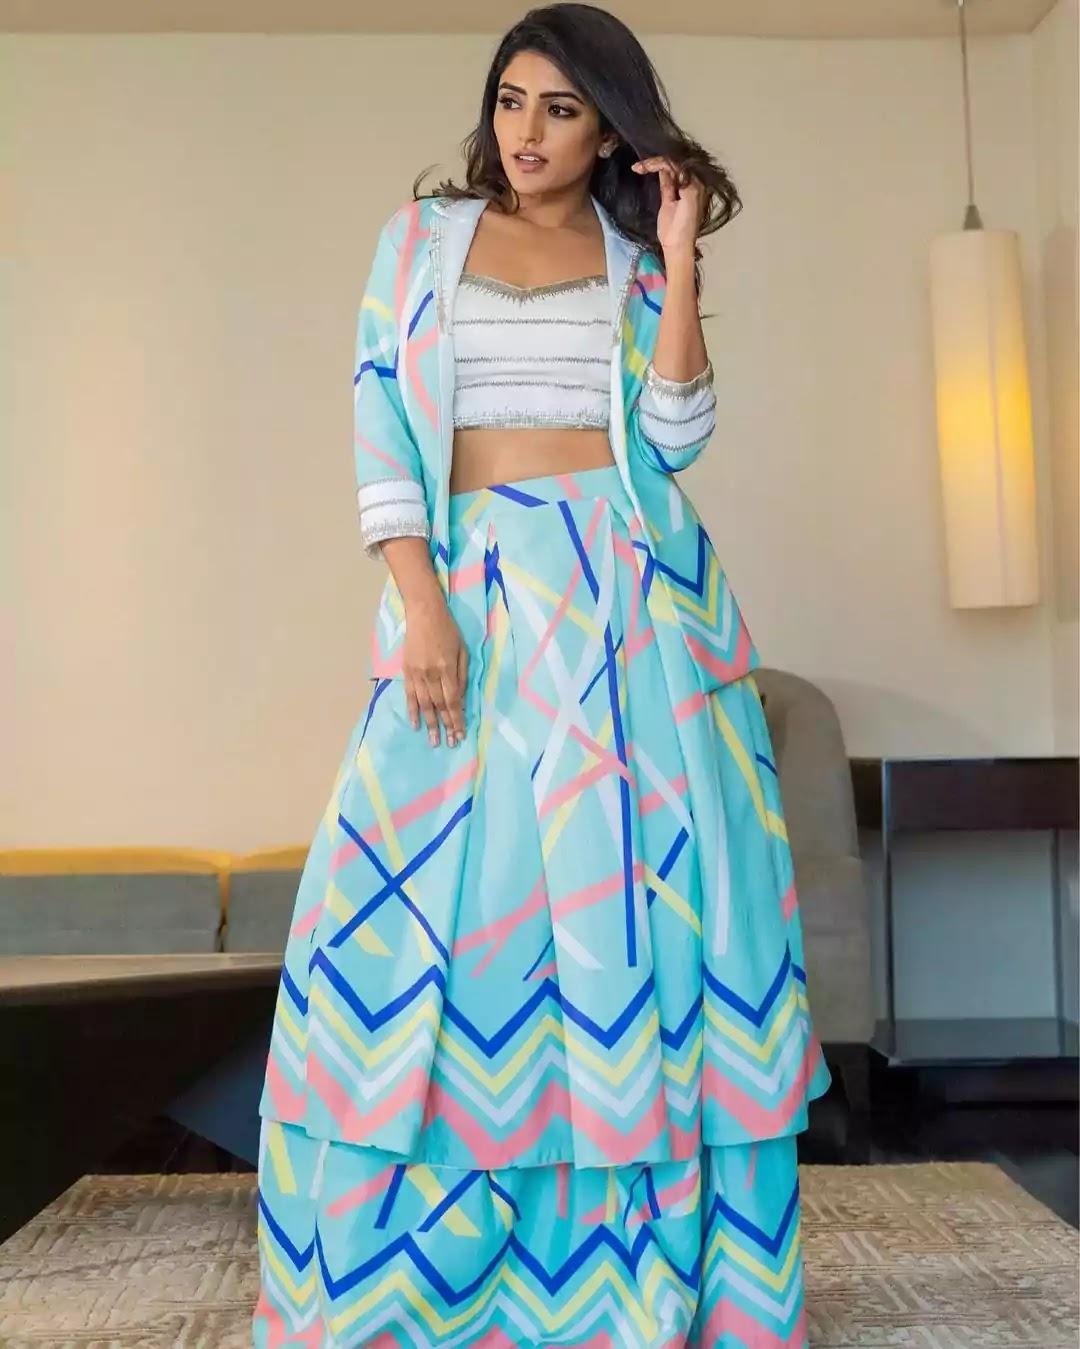 eesha-rebba-in-printed-blazer-and-skirt